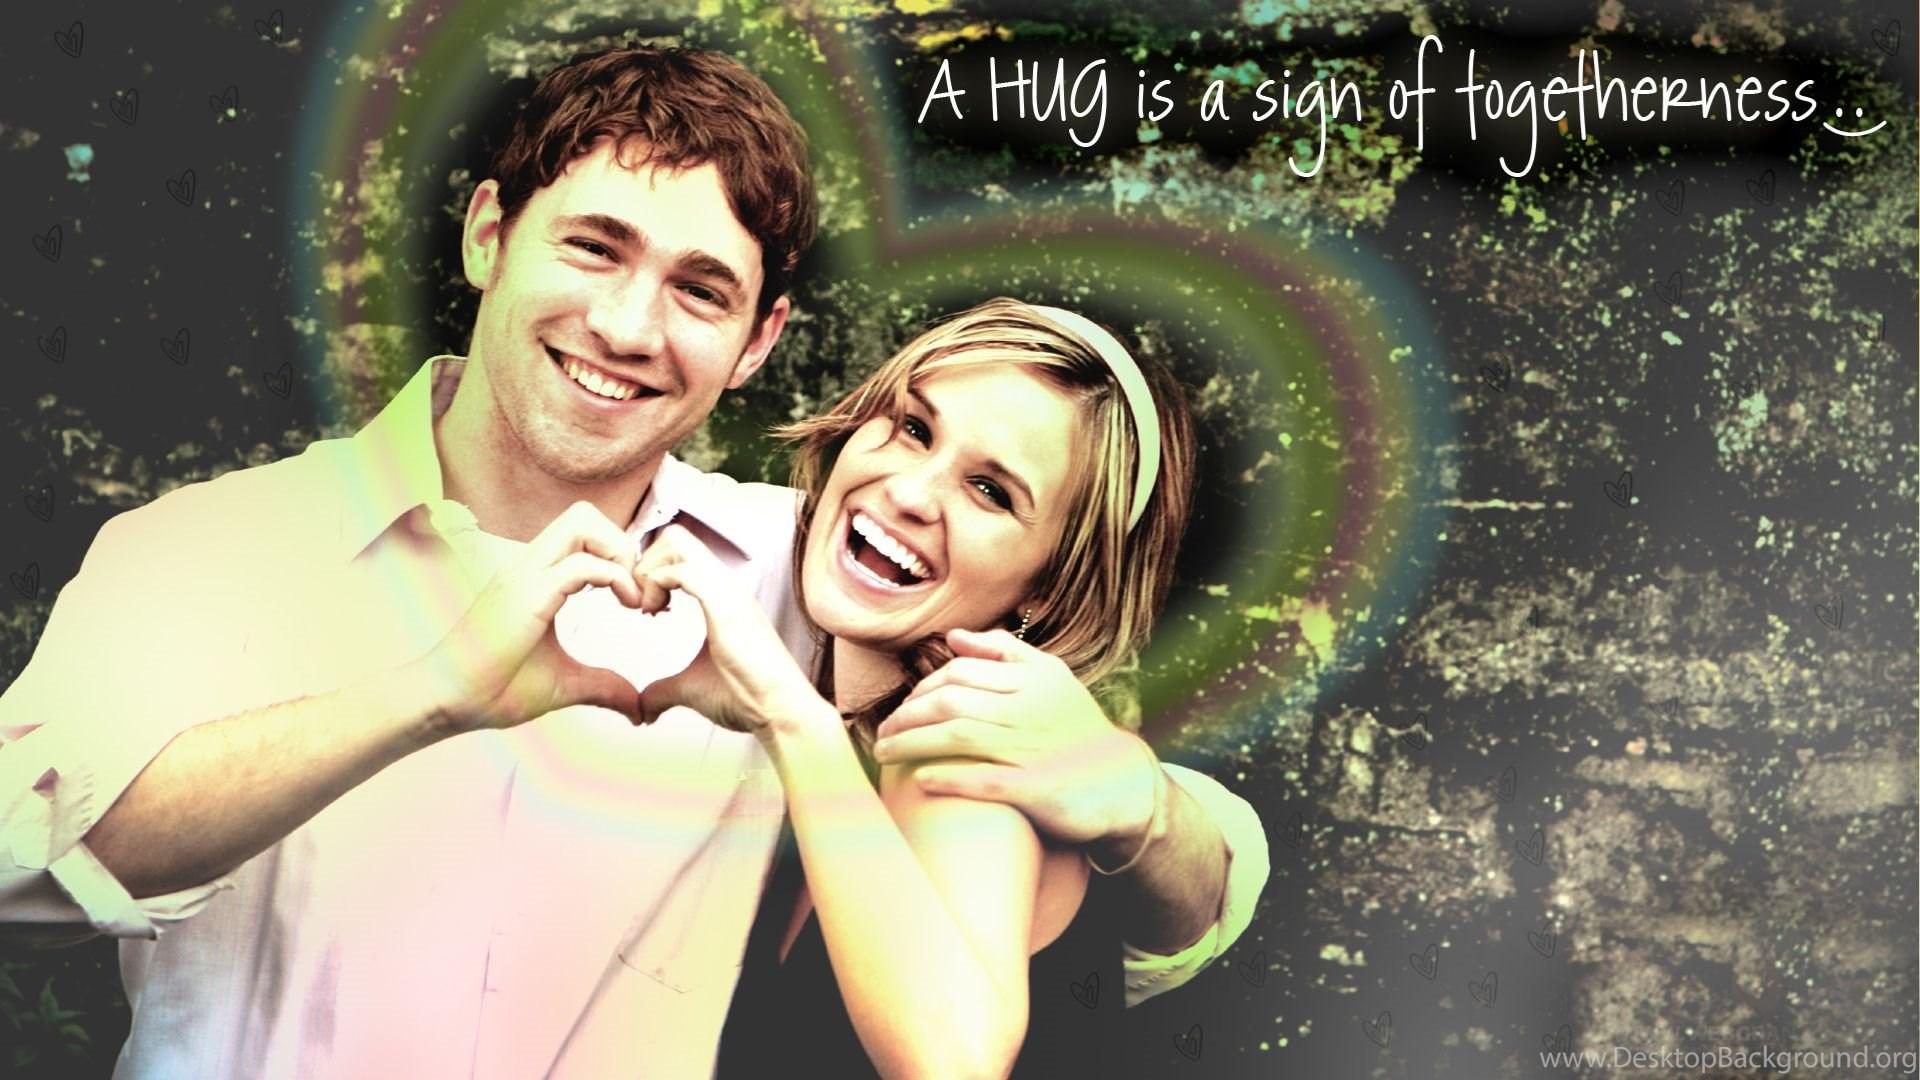 cute romantic couples hd wallpaper desktop background